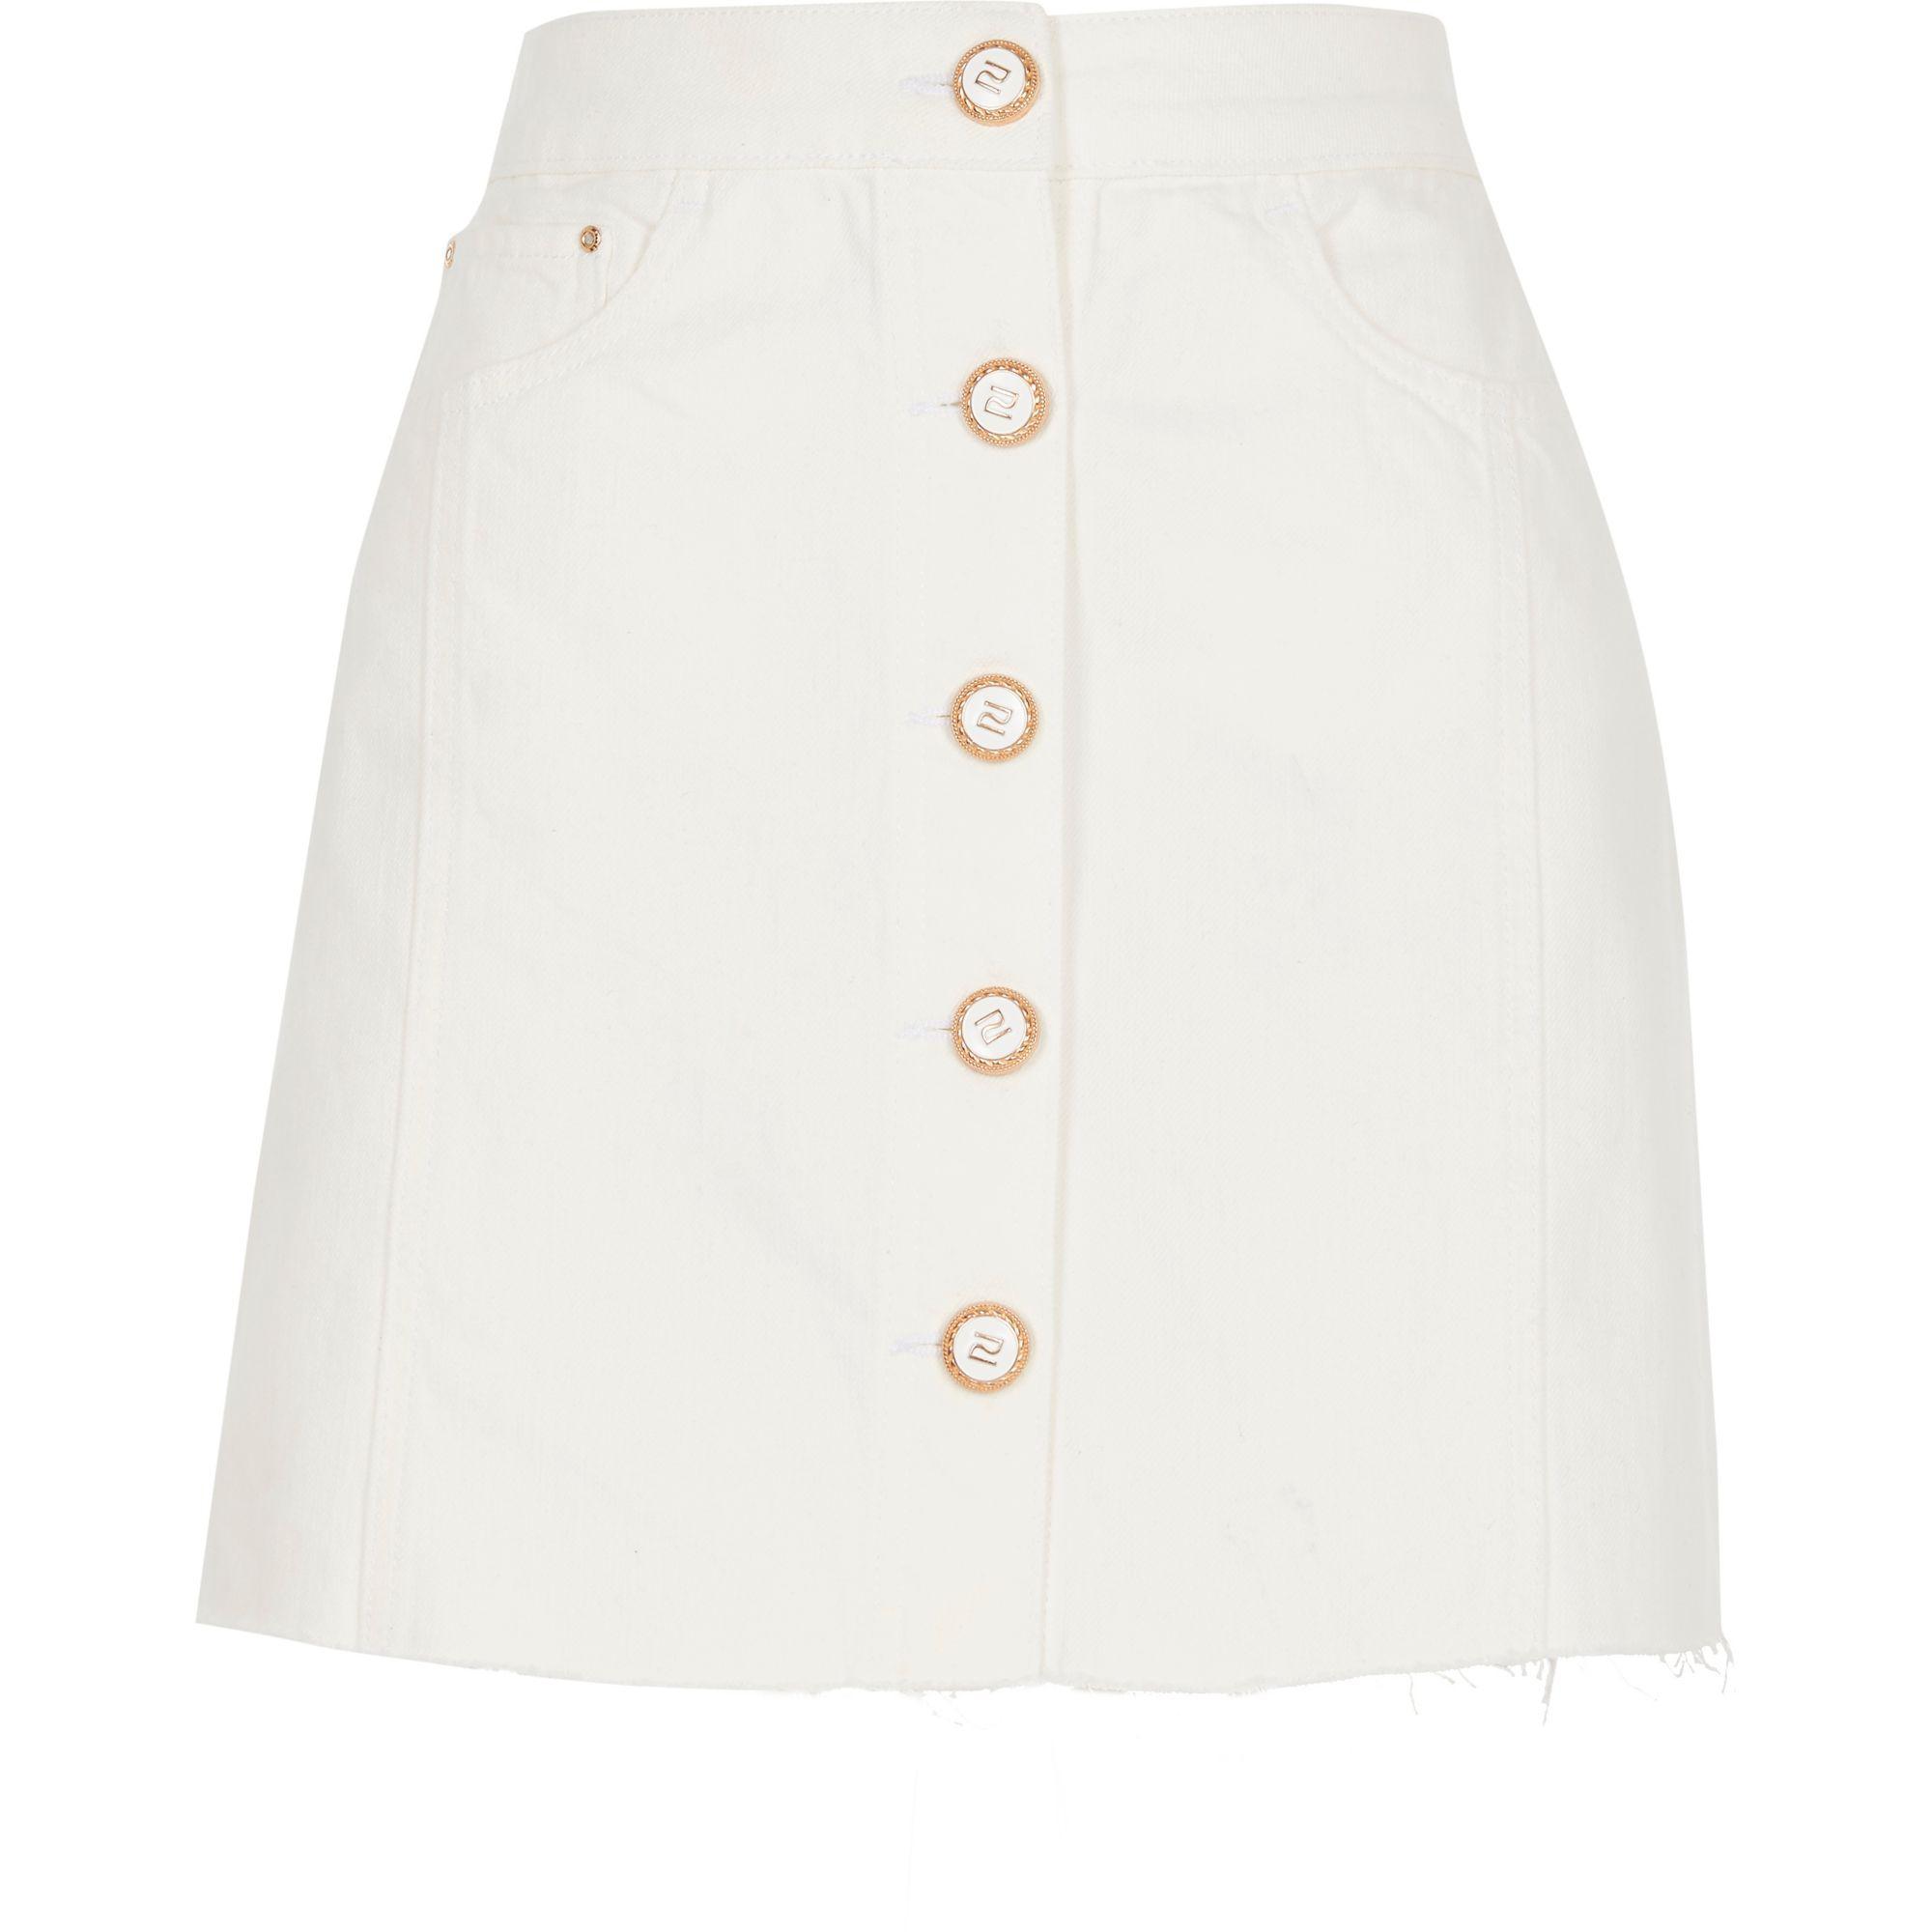 843c72371 River Island Petite White Button Front Denim Mini Skirt in White - Lyst